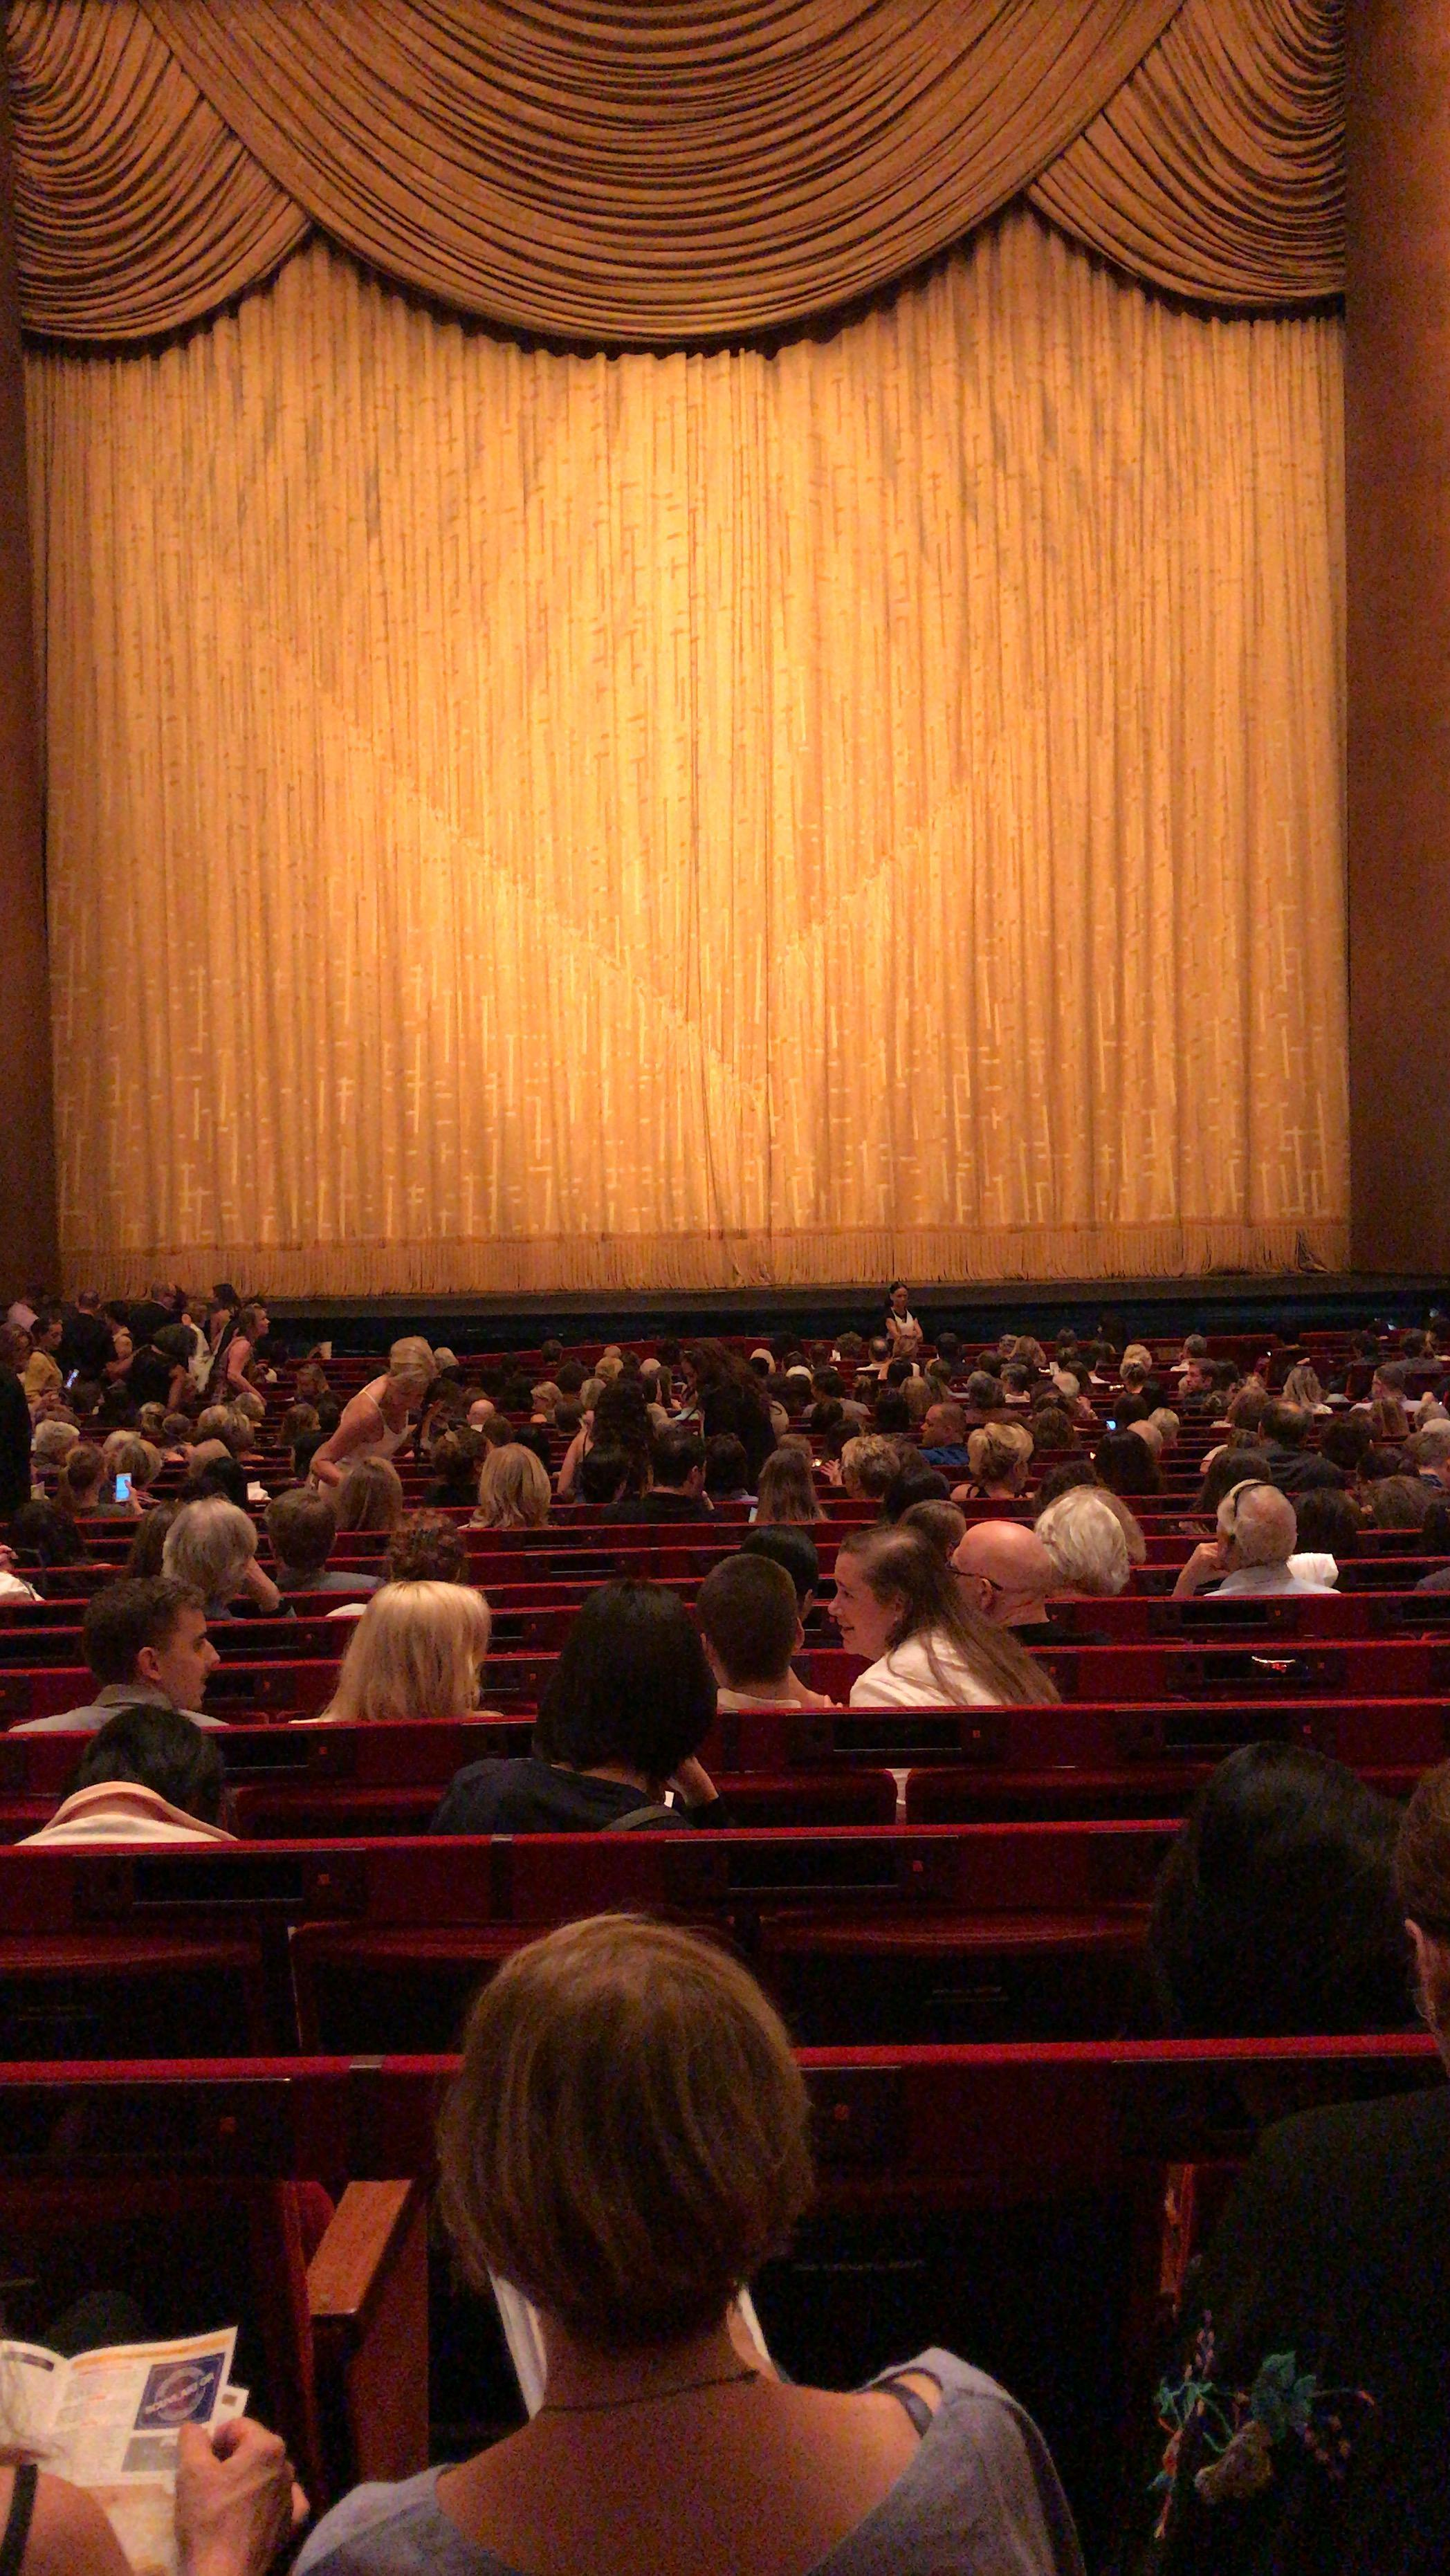 Metropolitan Opera House - Lincoln Center Section Orchestra Row Z Seat 110